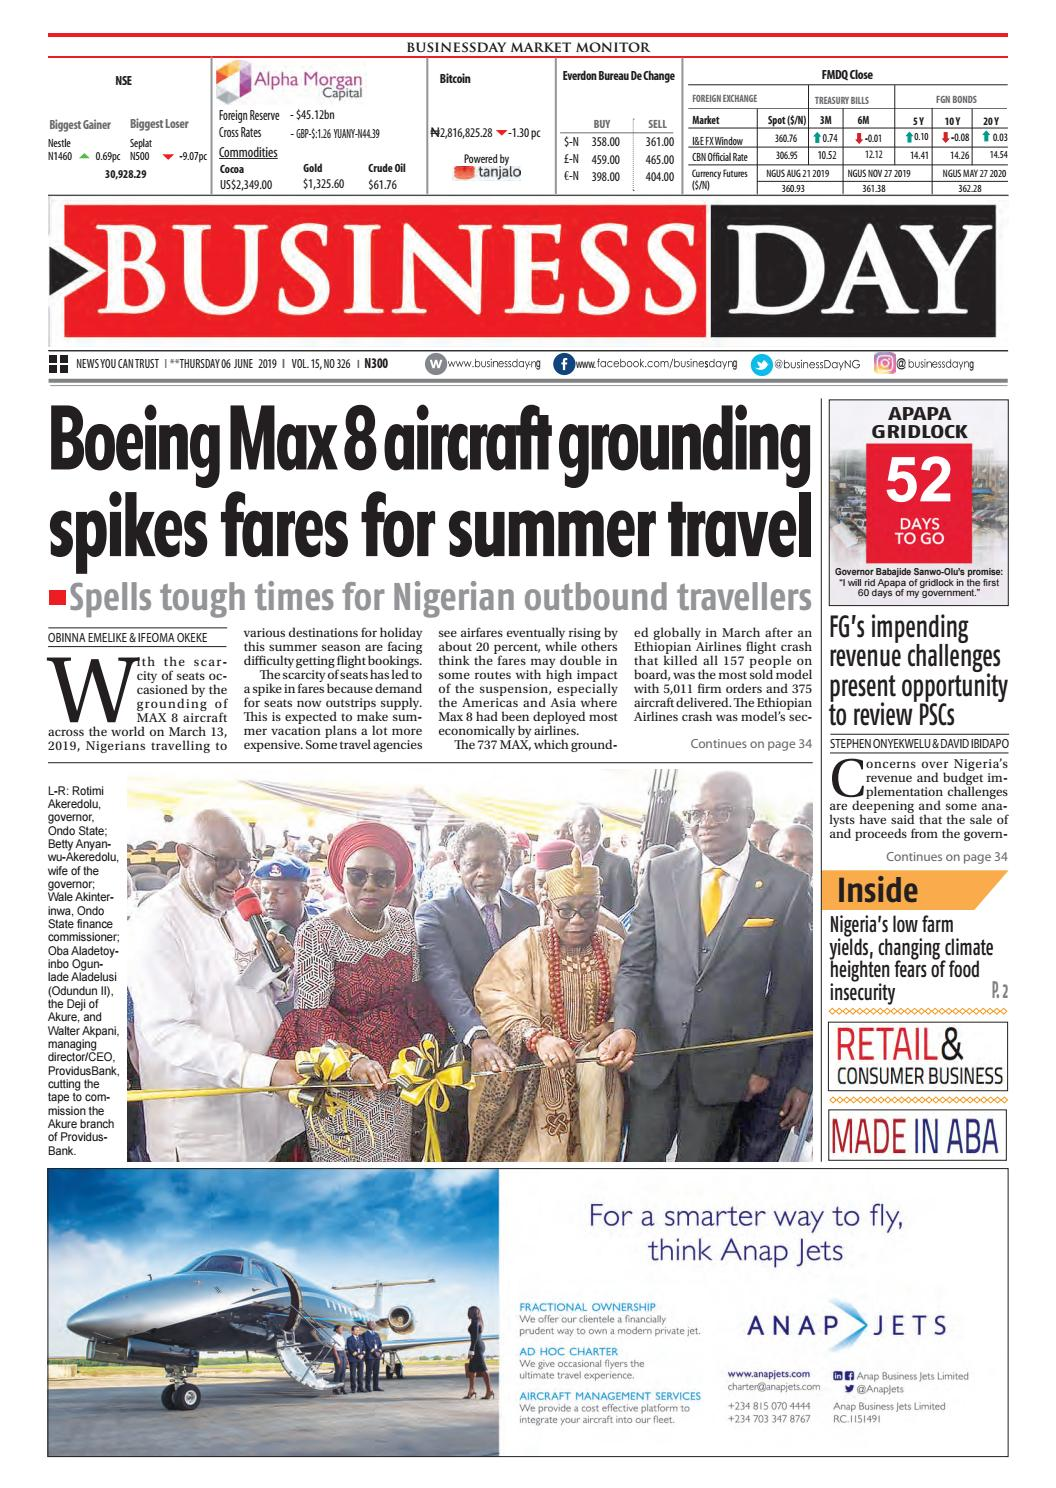 BusinessDay 06 Jun 2019 by BusinessDay - issuu